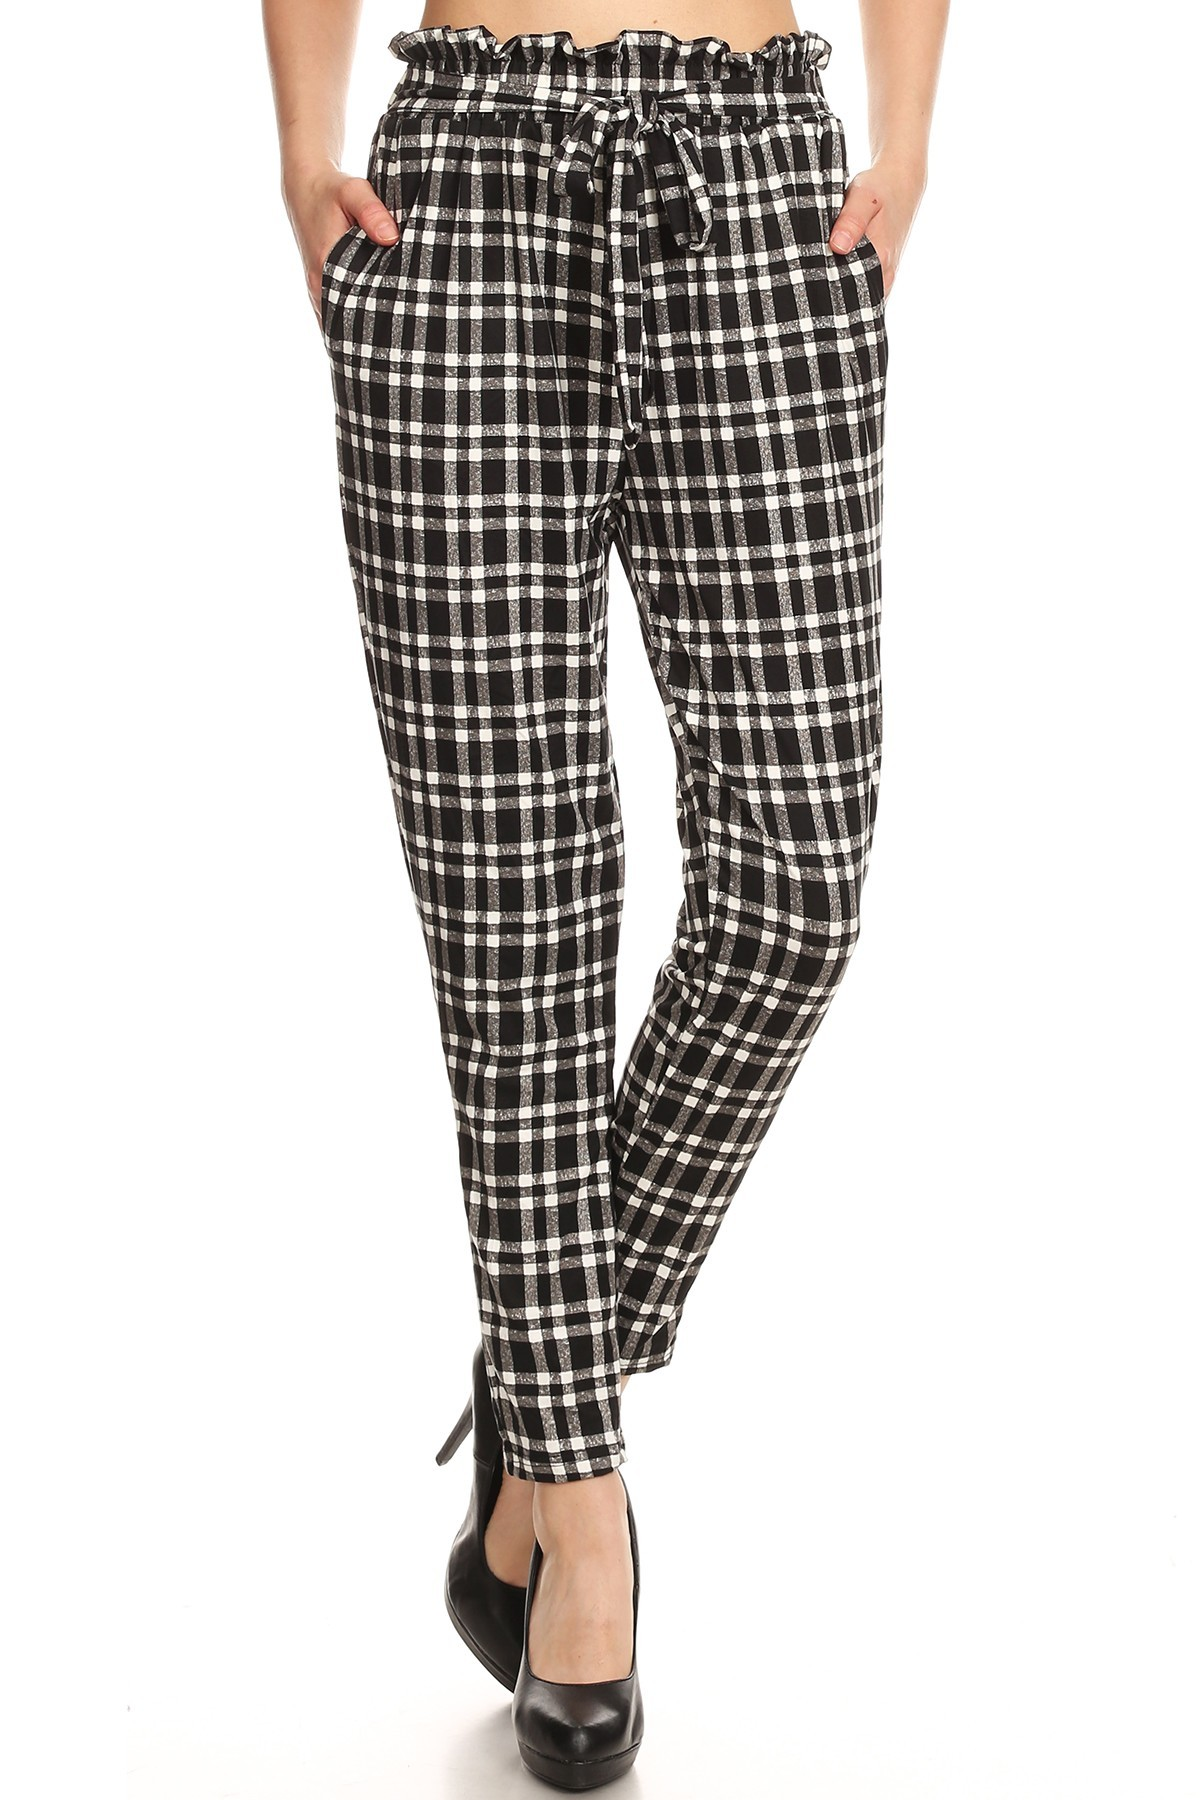 BLACK/WHITE PLAID PRINT PAPER BAG WAIST PANTS#8PNT03-02